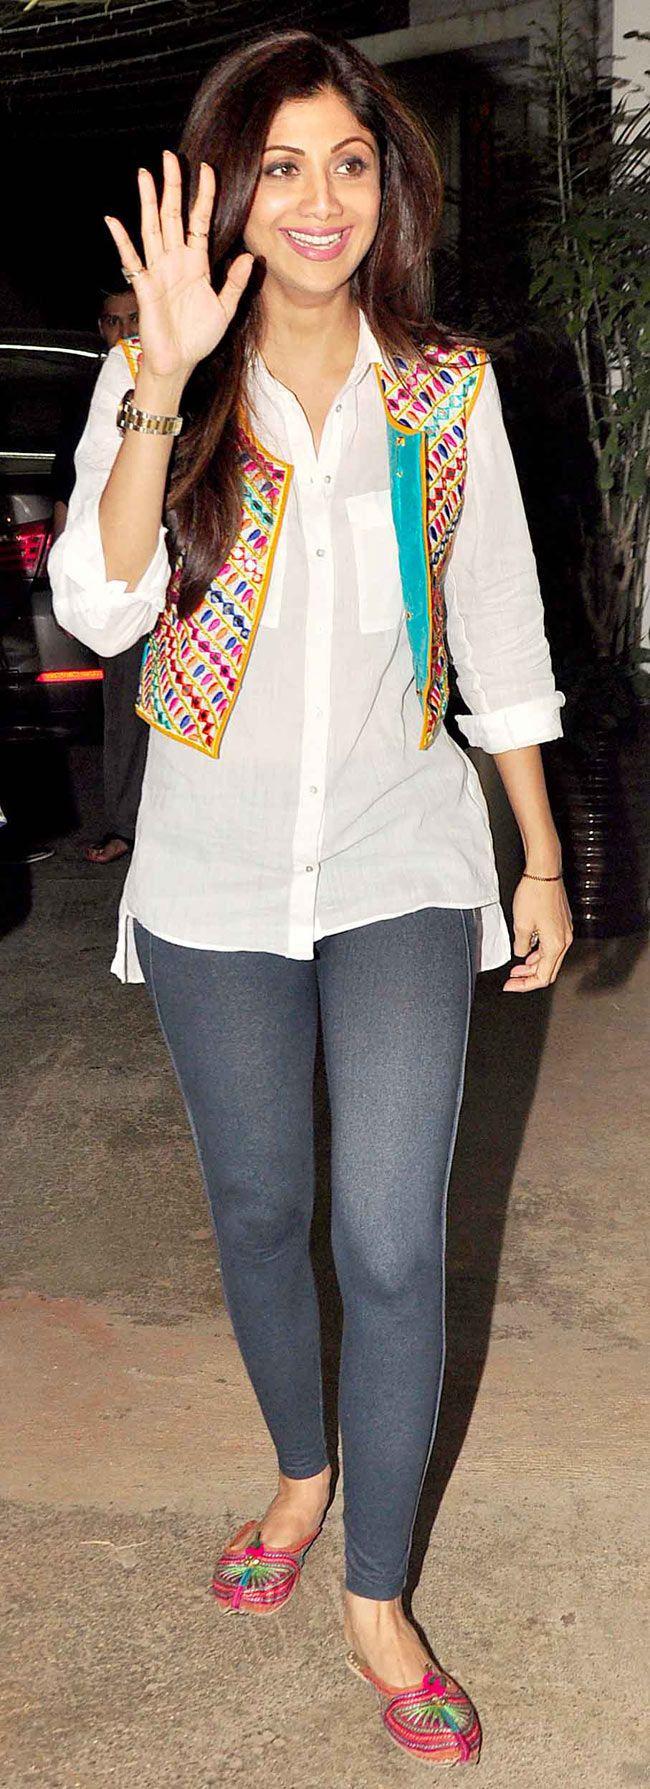 Shilpa Shetty at the screening of 'Chaar Sahibzaade'.